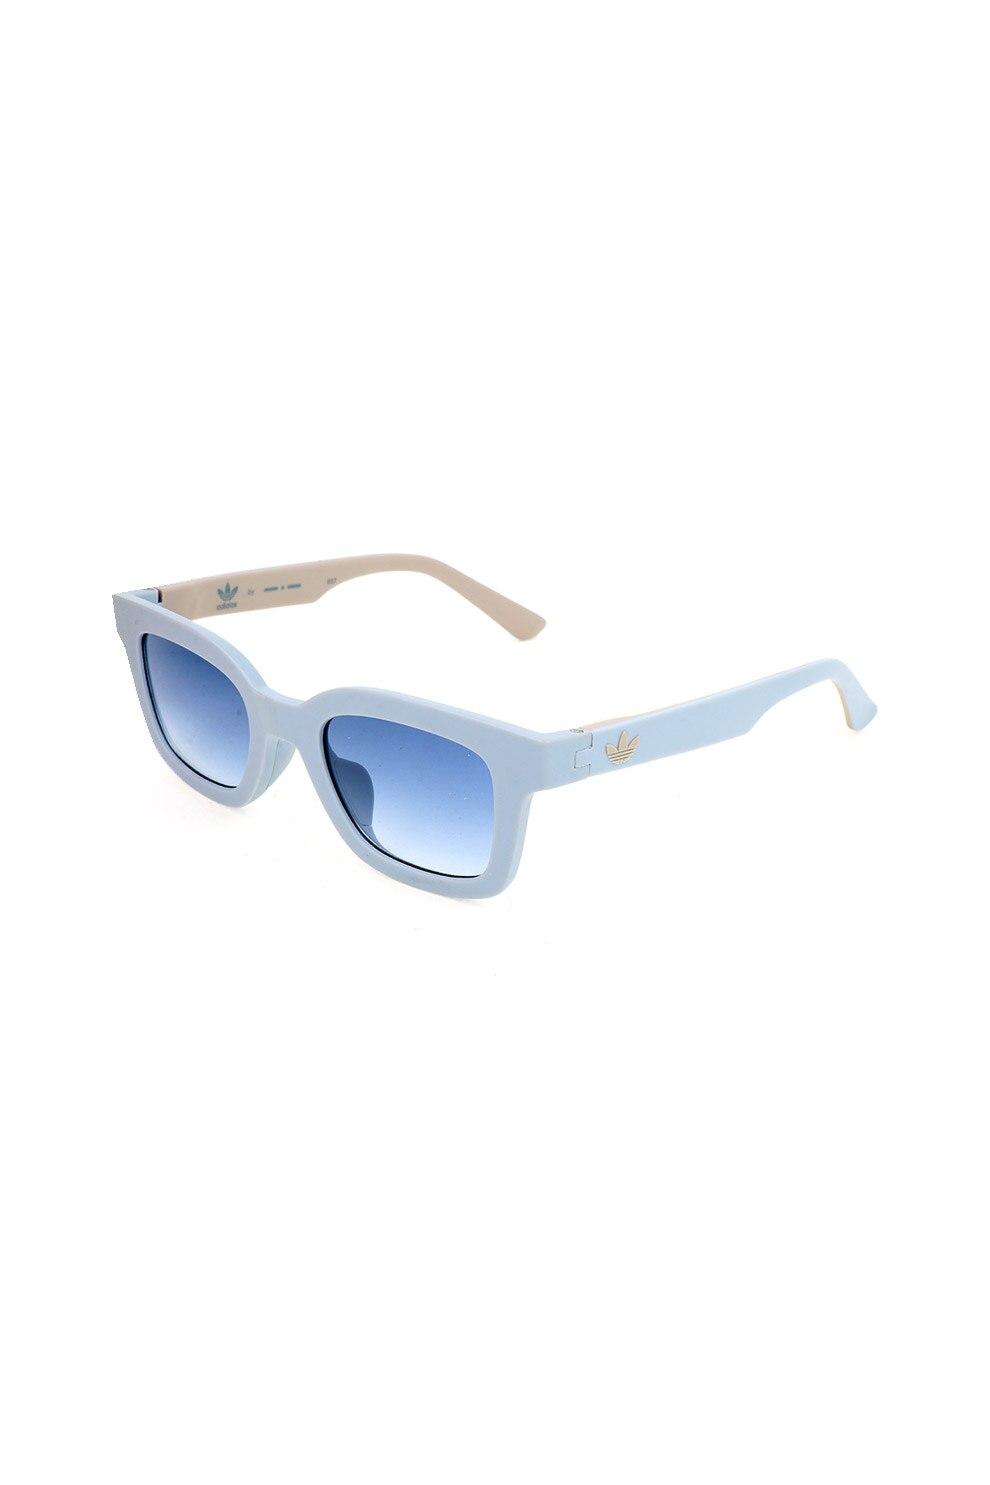 adidas ORIGINALS, Szögletes uniszex napszemüveg, Pasztellkék/Bézs, 48-22-145 Standard IX5X5c